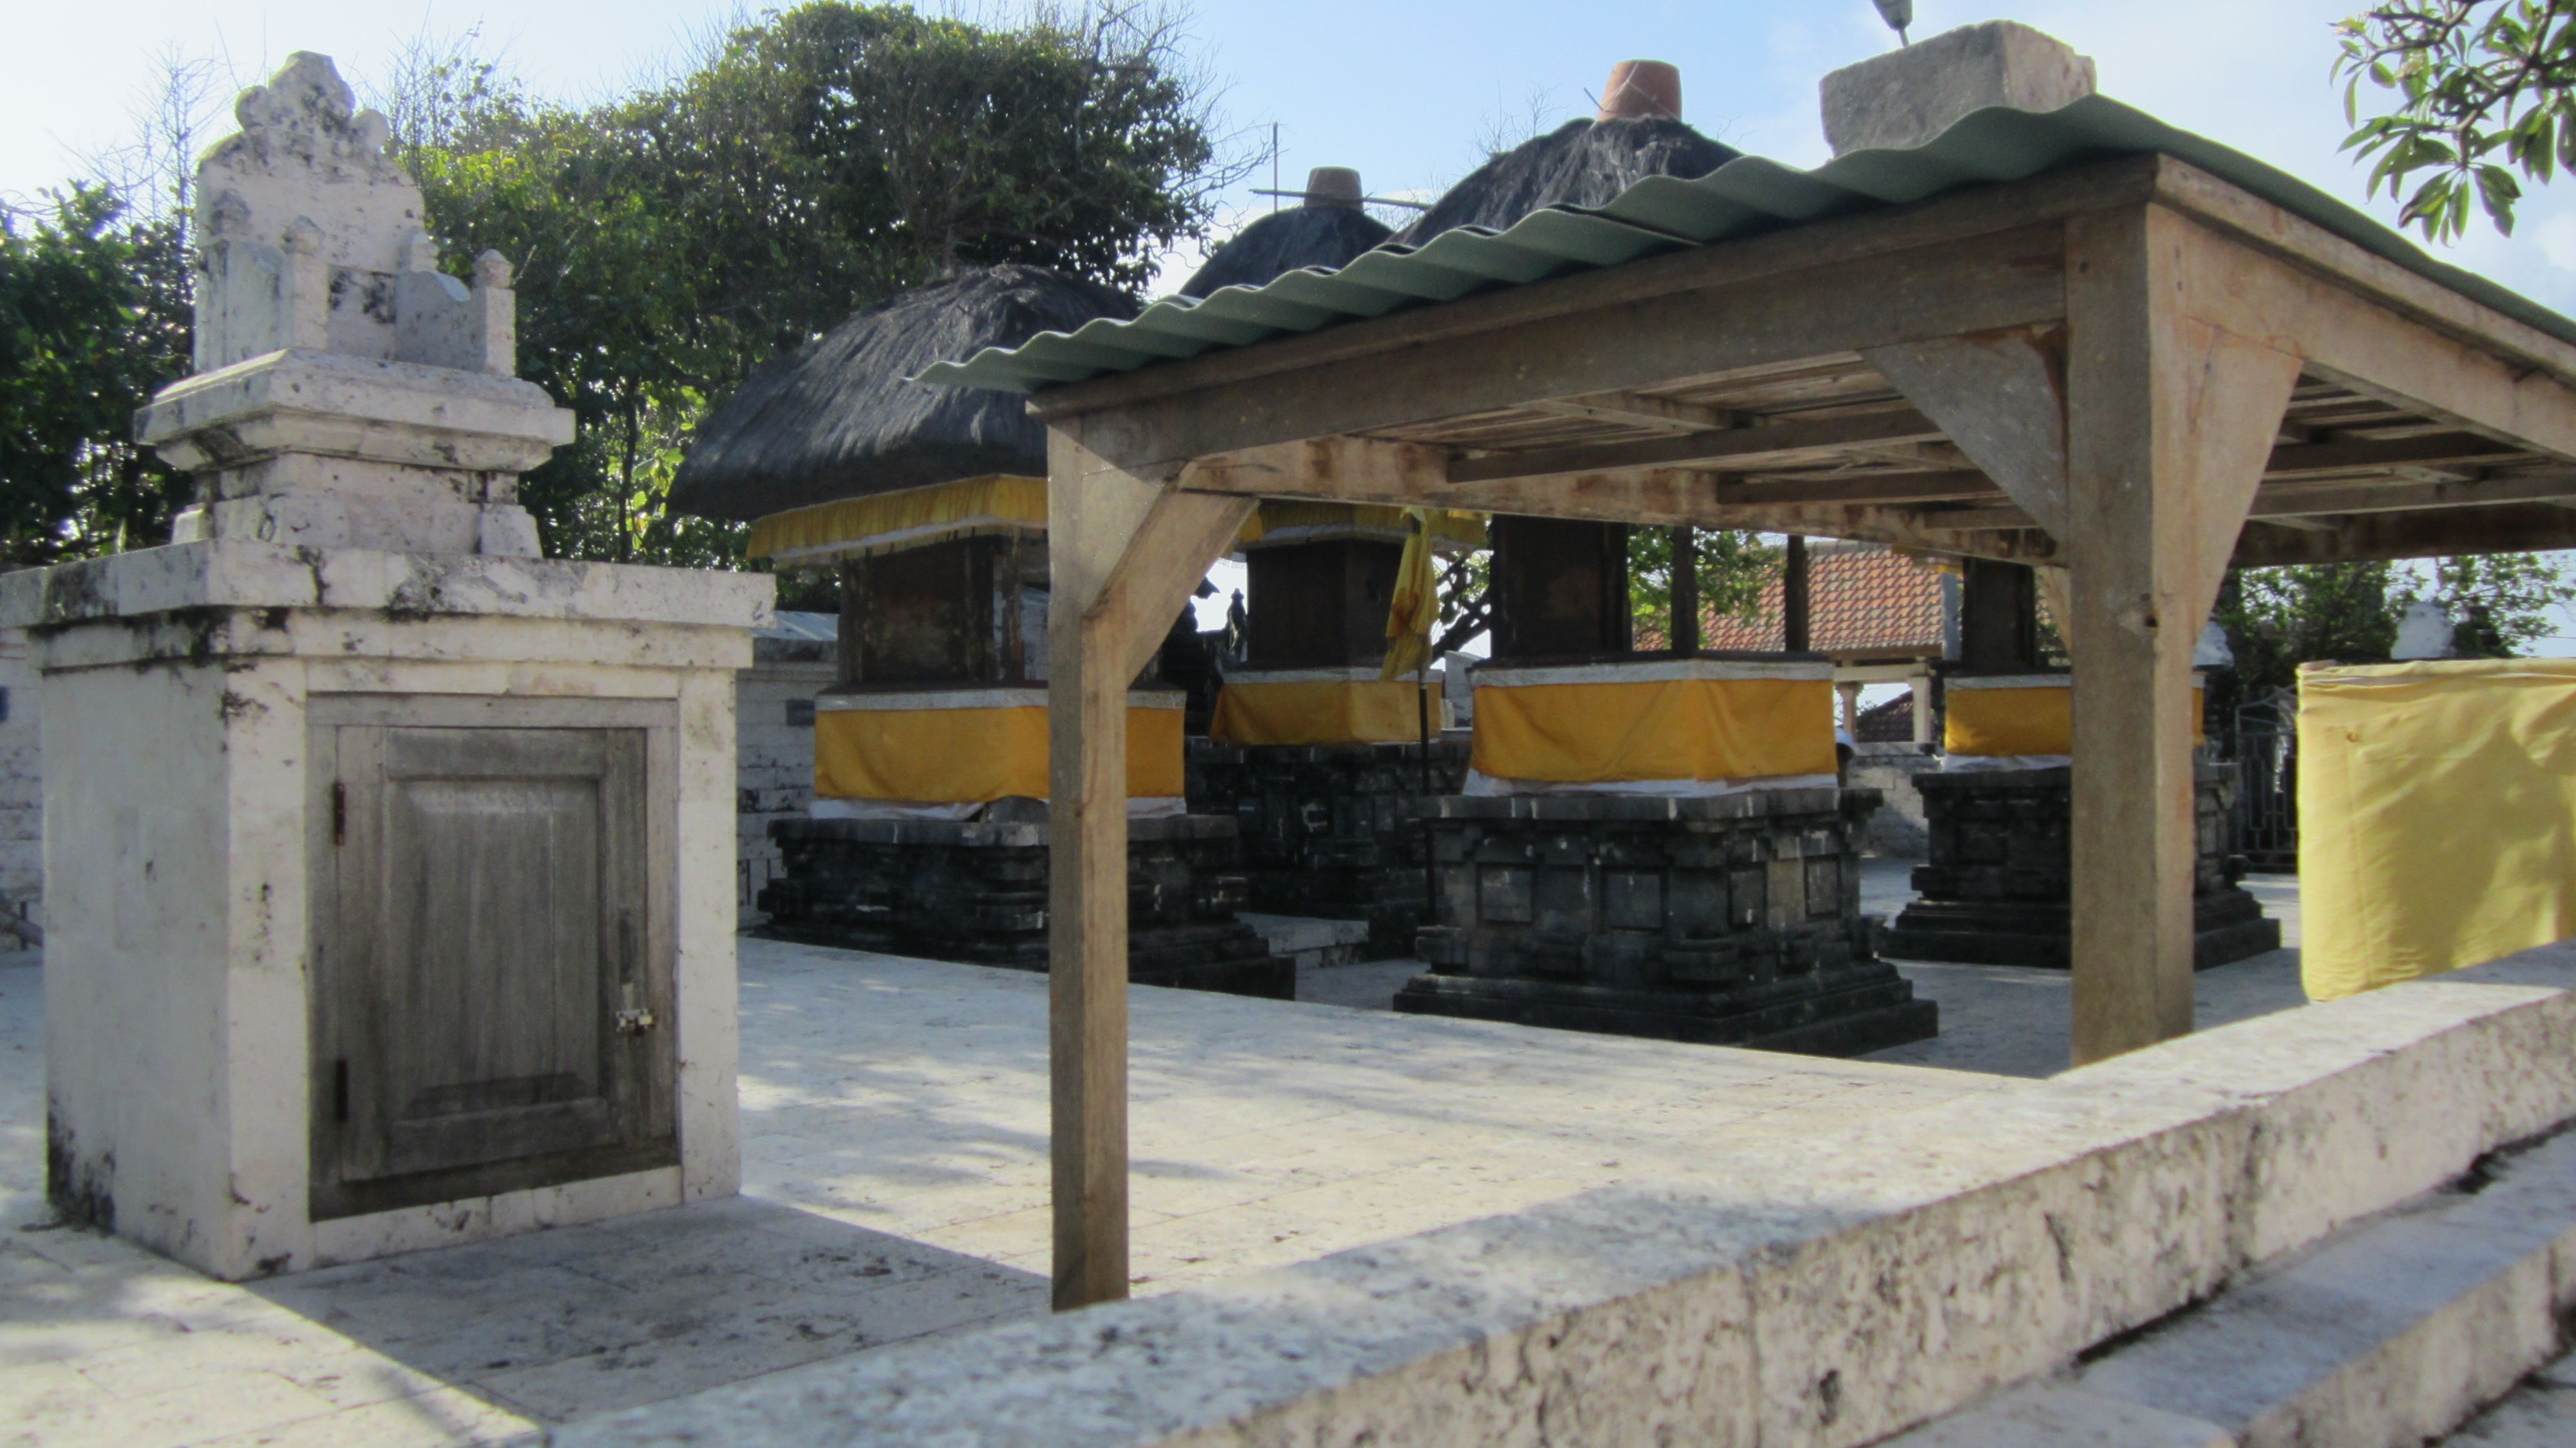 Pin by S.Murugavel on Yogyakarta & Bali Outdoor decor